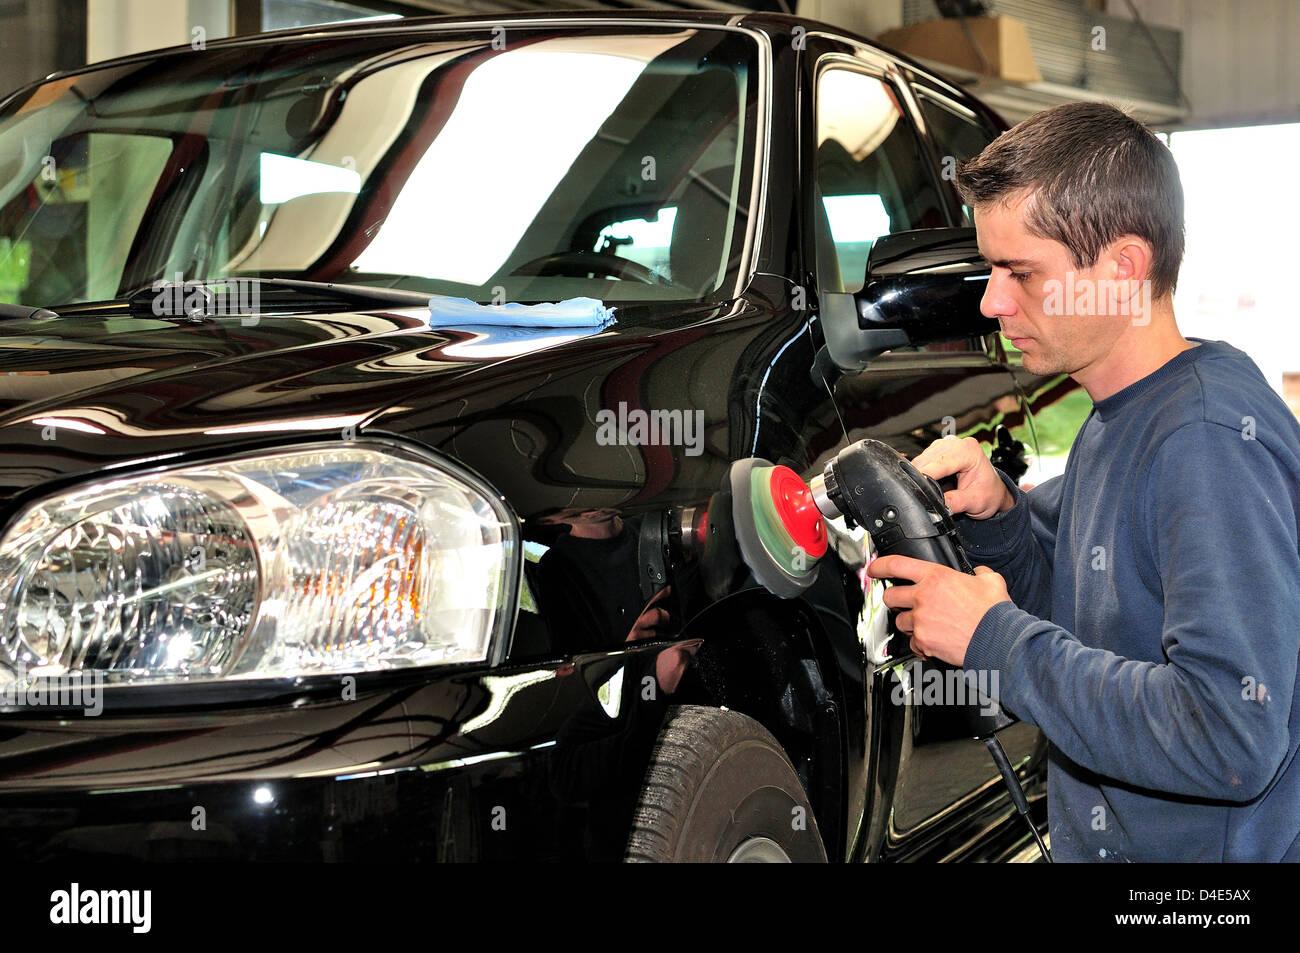 Body shop worker polishing black car. - Stock Image